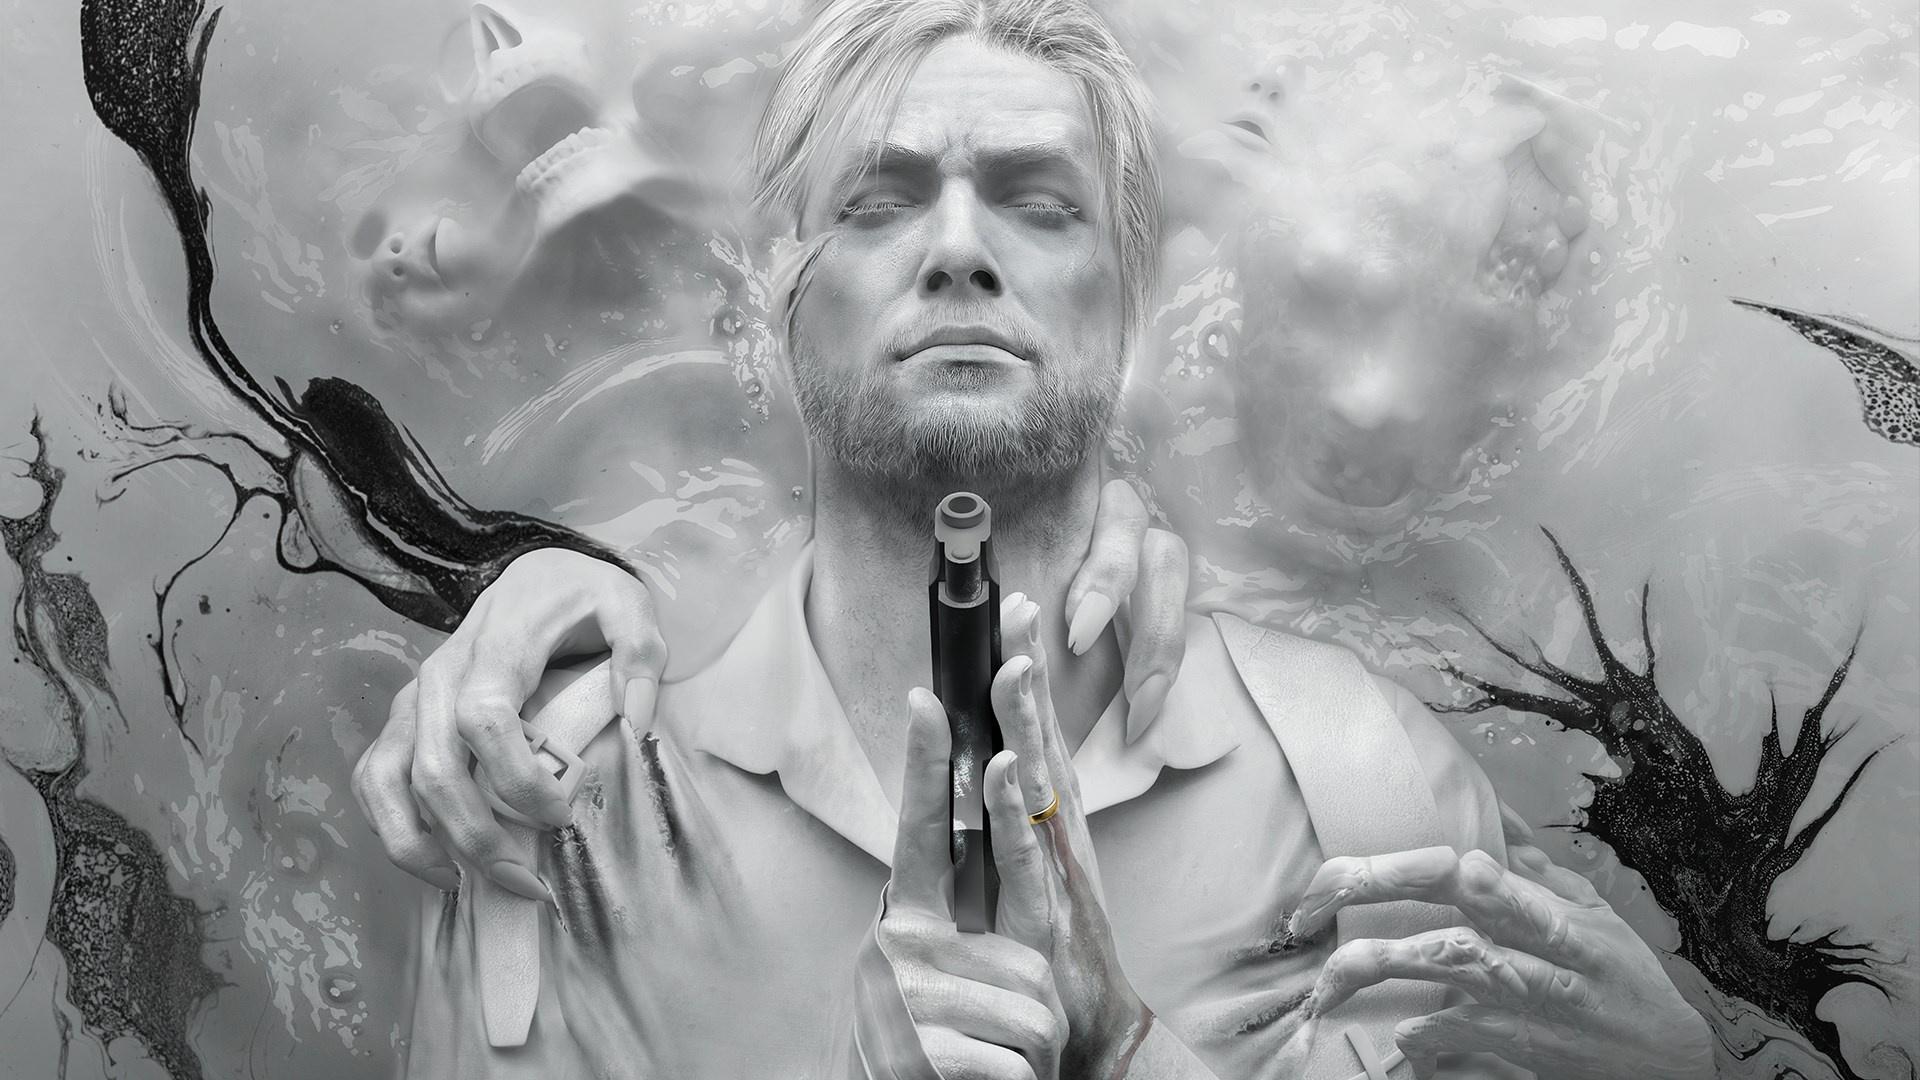 Распродажа в Microsoft Store: The Evil Within2, Red Dead Redemption2 и Jedi Fallen Order